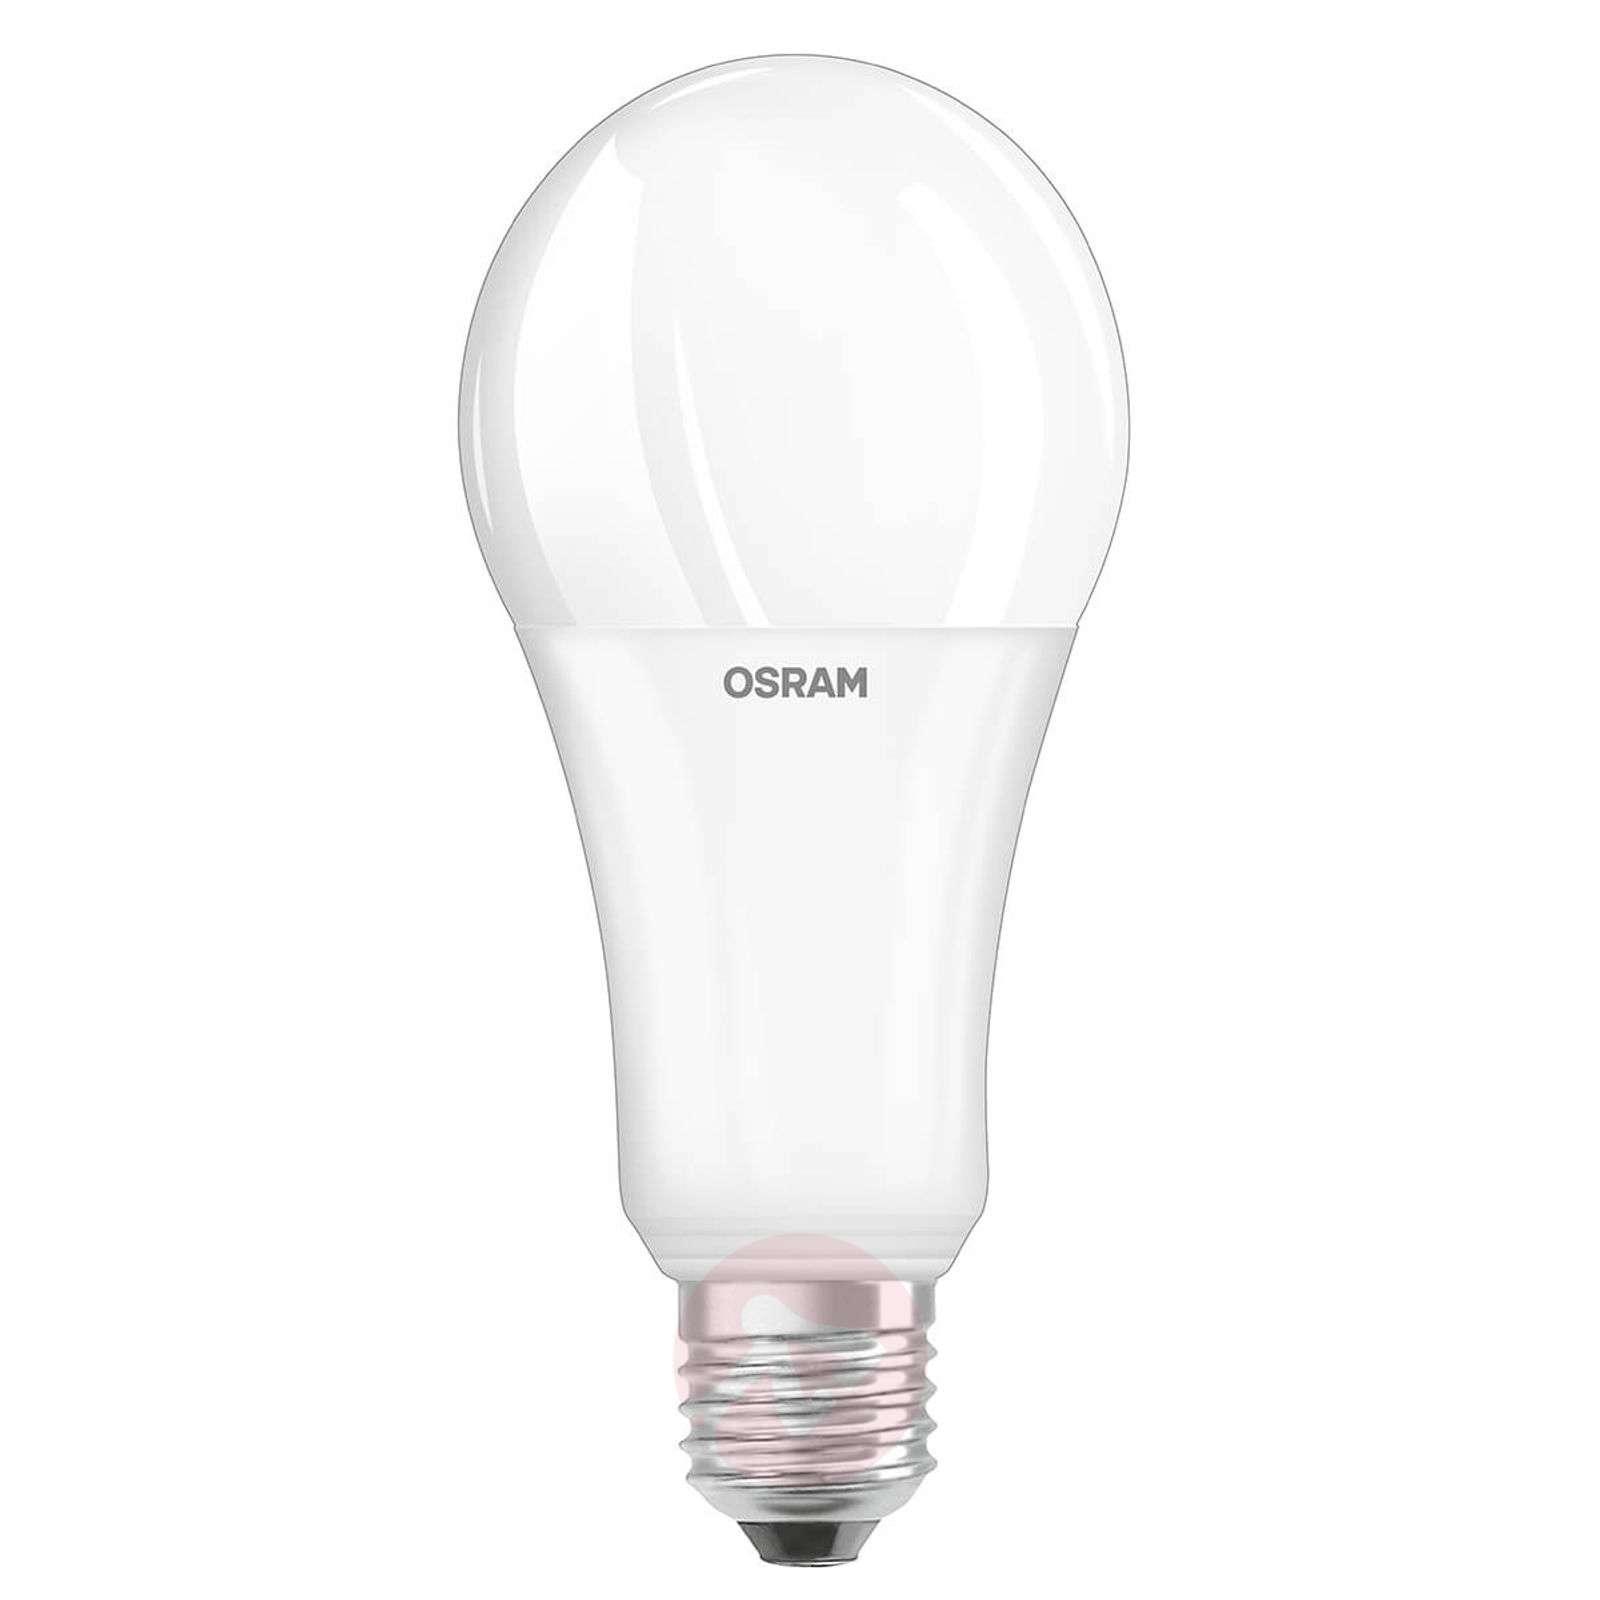 LED-lamppu E27 19 W, lämmin valkoinen, 2452 lm-7262047-01